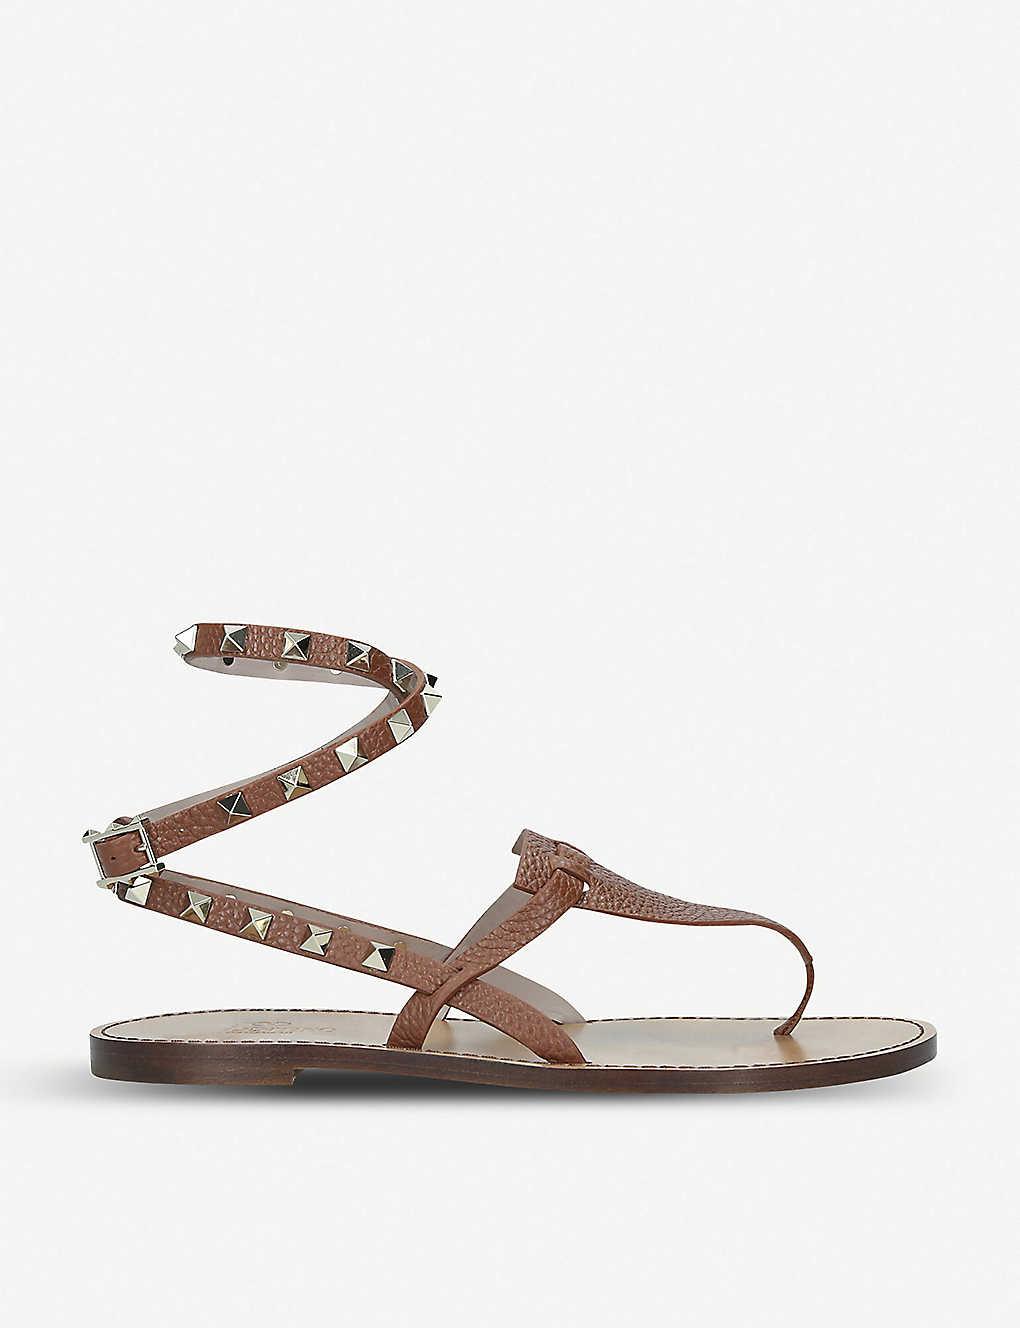 Rockstand Valentino Ankle Leather Sandals Strap J3KTl1uFc